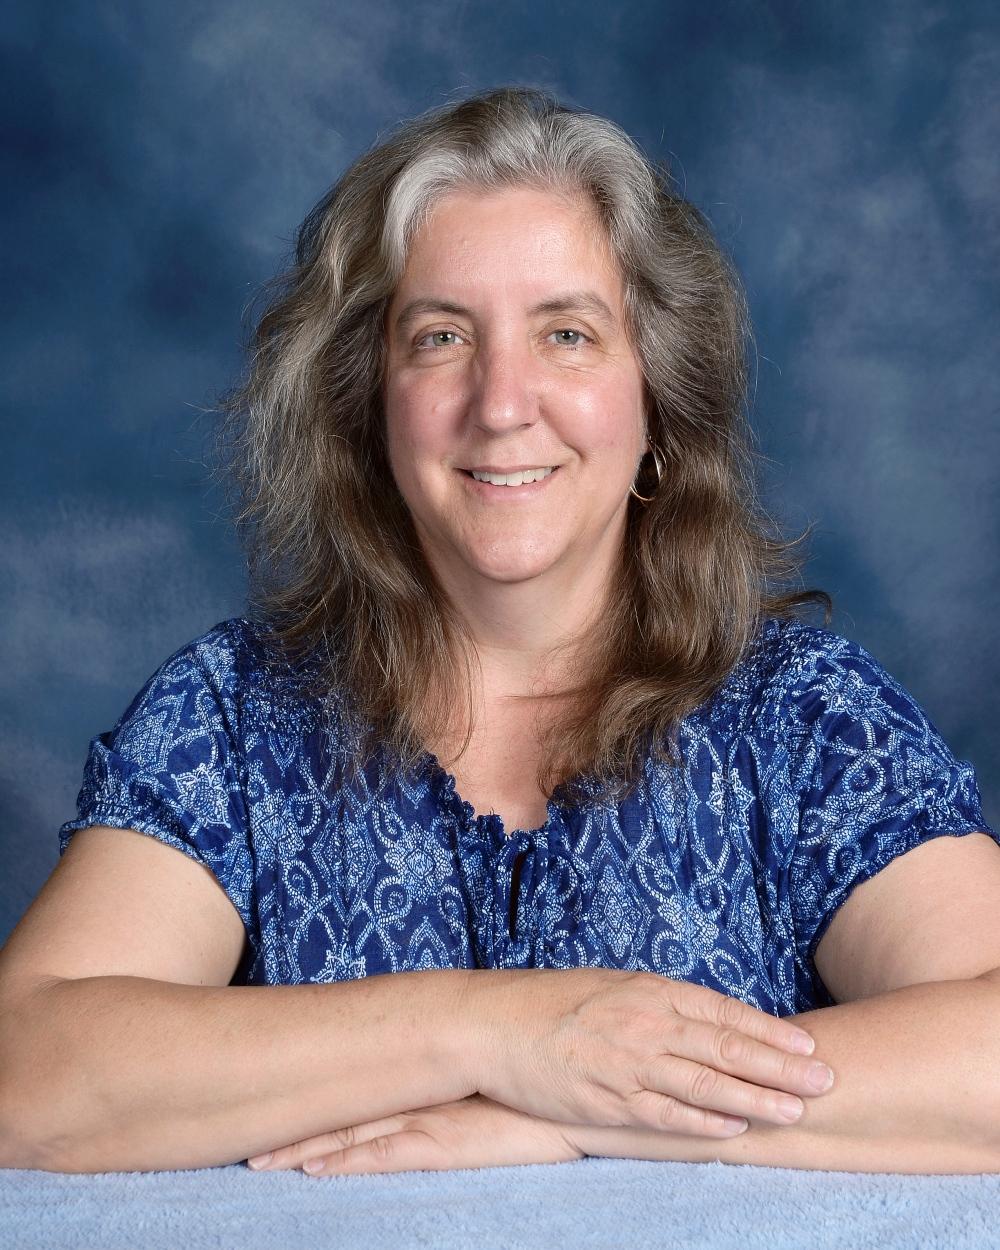 Arlene Suggs